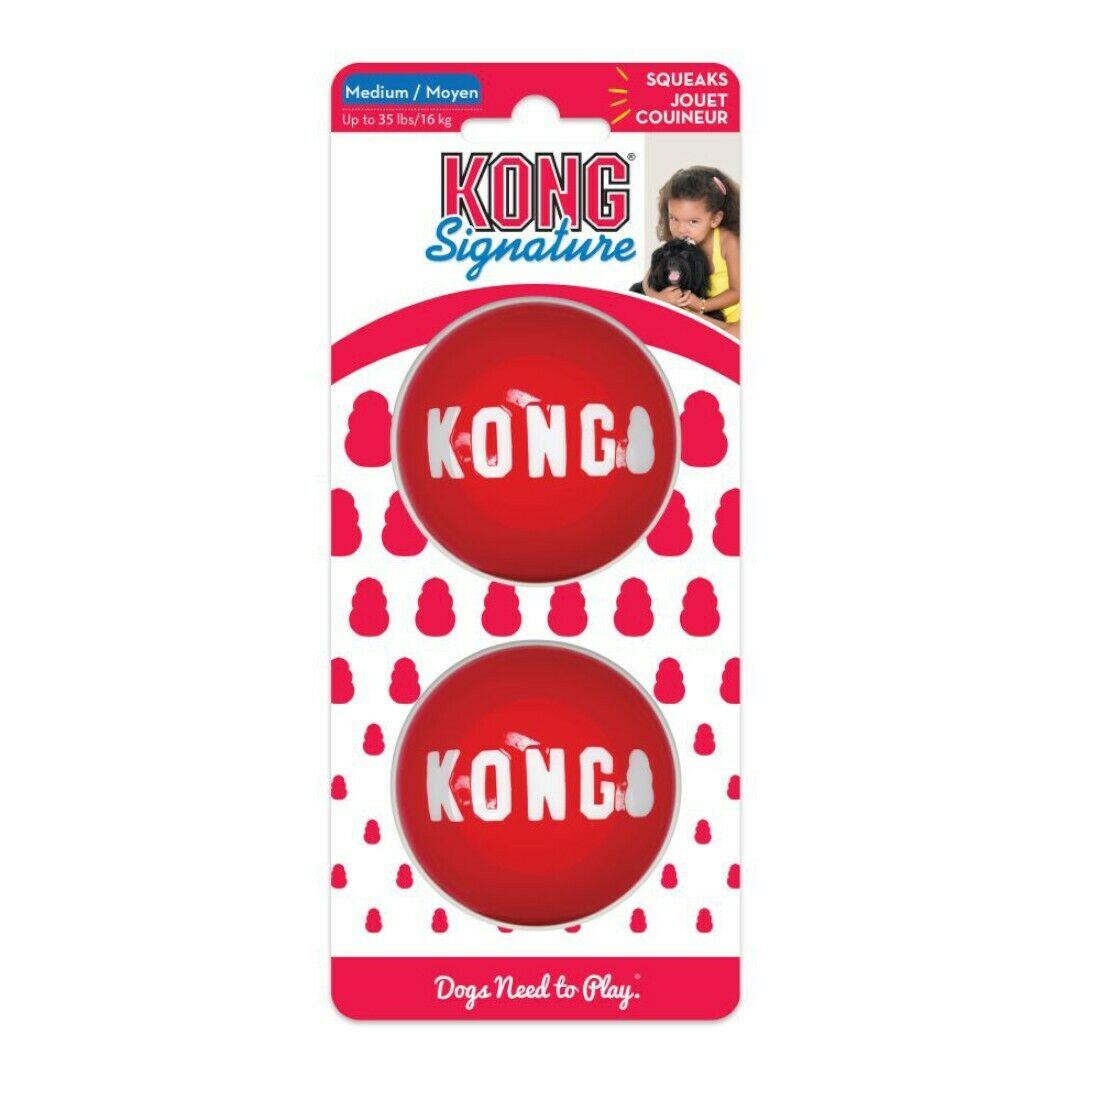 KONG Signature Ball Dog Toy, 2-pack, Medium